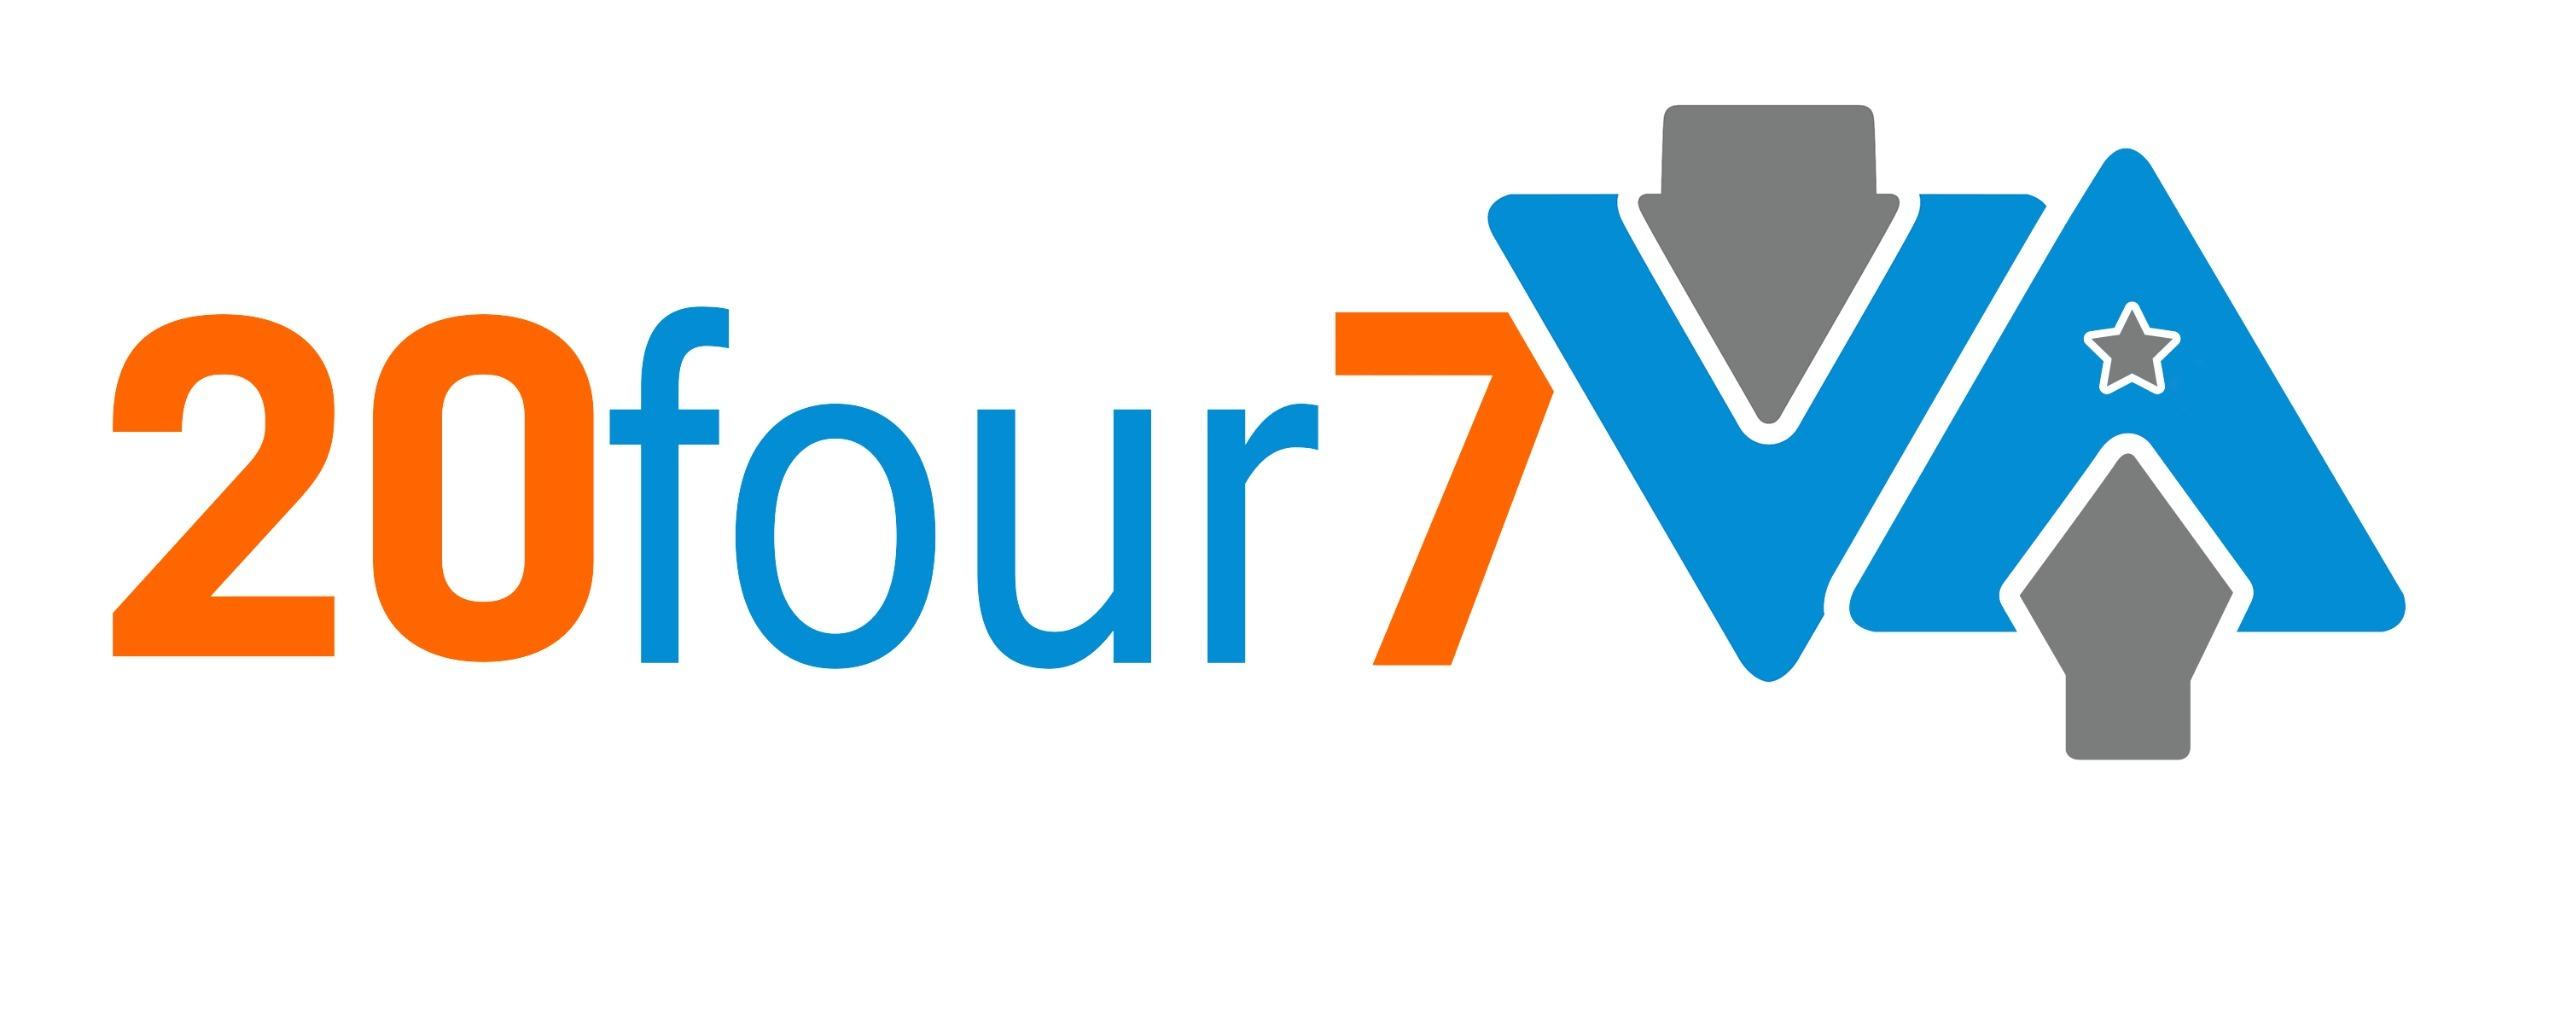 20Four7VA (@20four7va) Cover Image